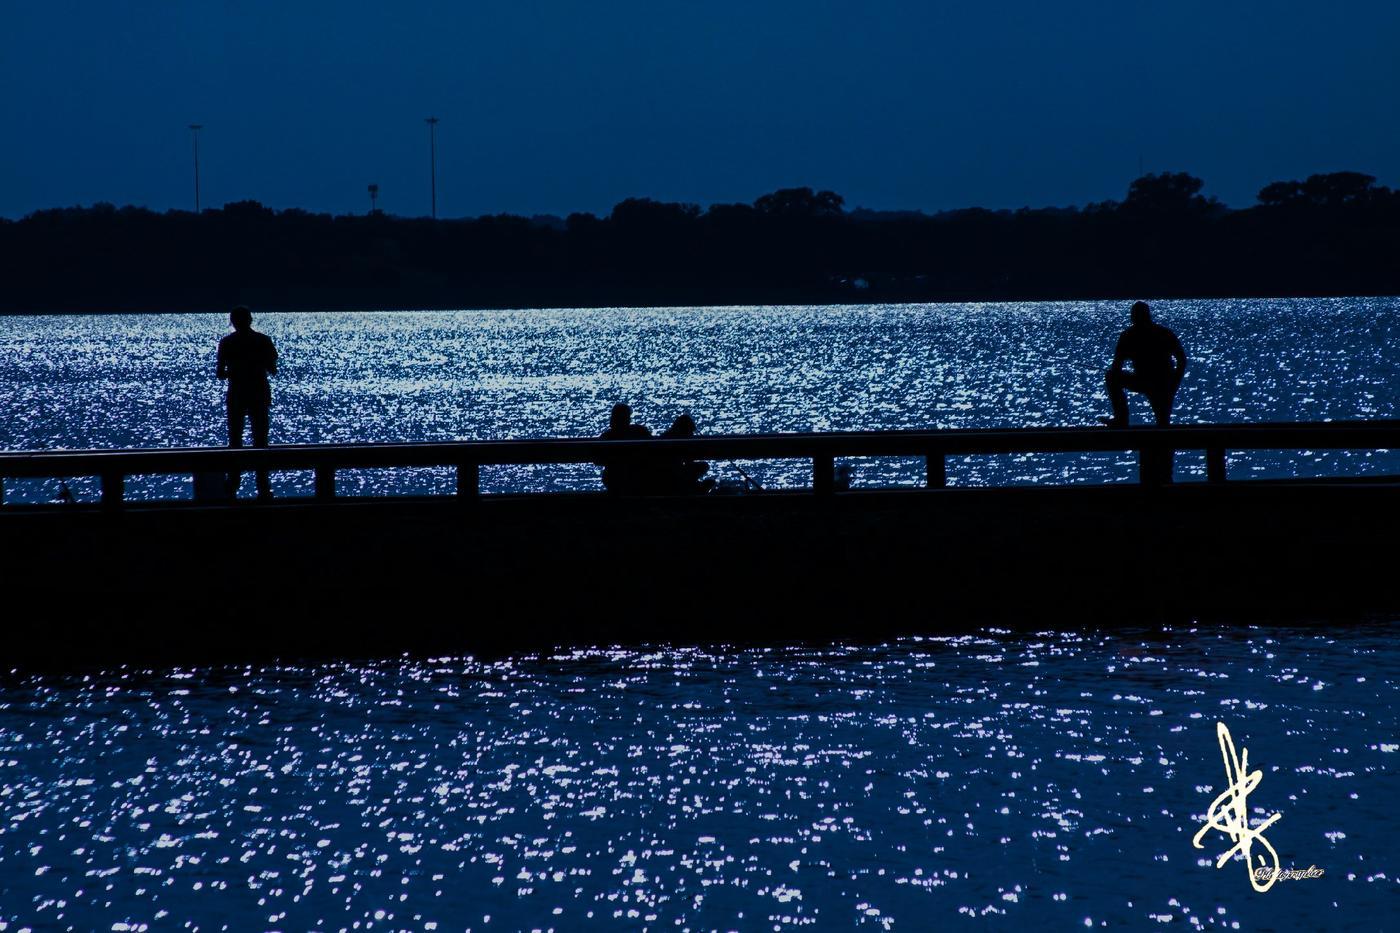 Pescando (Antonio Rodriguez)